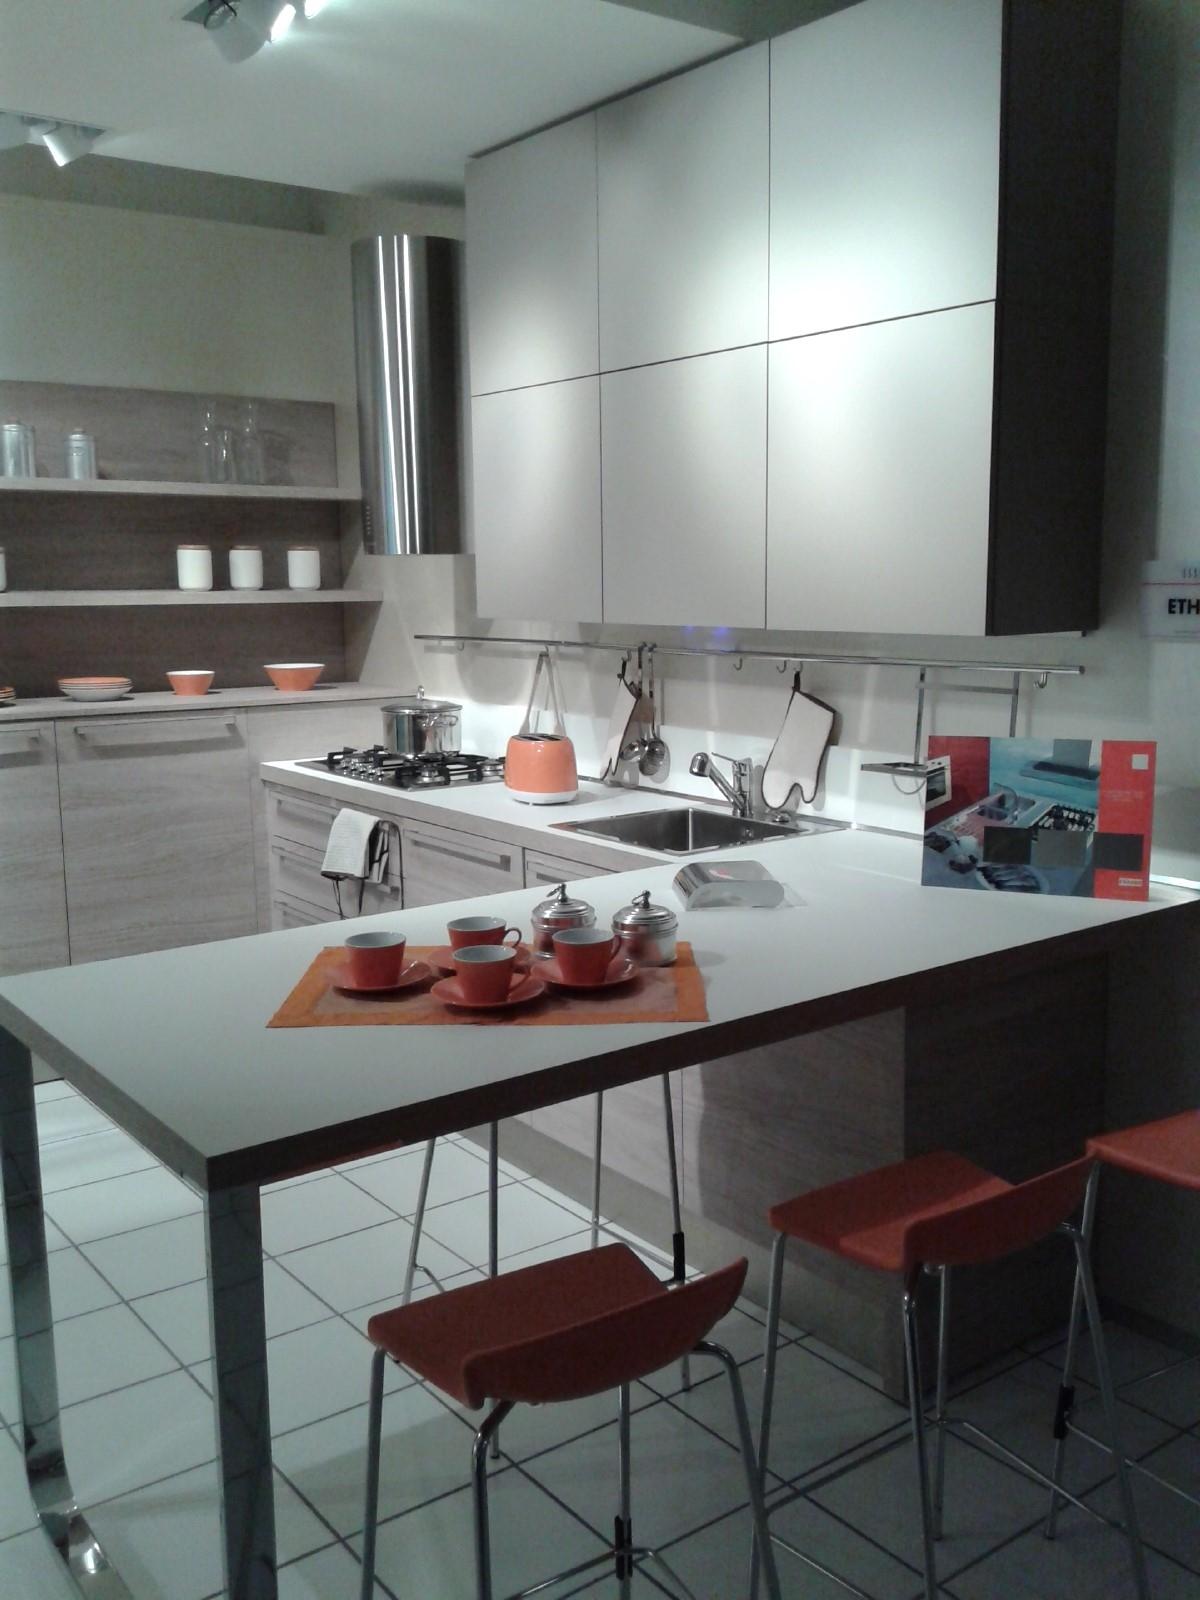 Cucina Veneta Cucine Ethica Decorativo Laminato Materico Cucine A  #8C503F 1200 1600 Veneta Cucine A Scomparsa